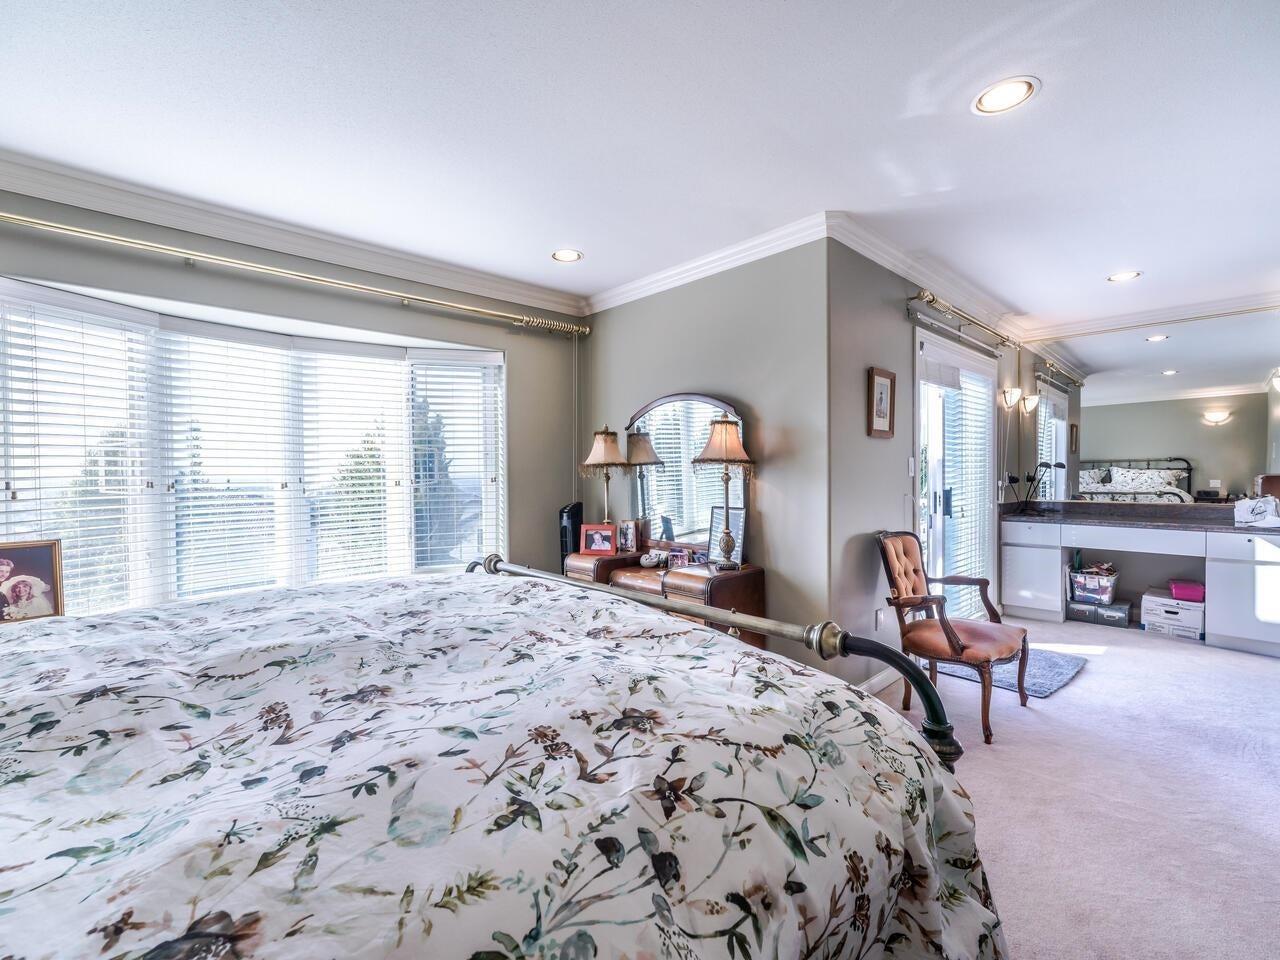 7888 JASPER CRESCENT - Fraserview VE House/Single Family for sale, 7 Bedrooms (R2622945) - #22